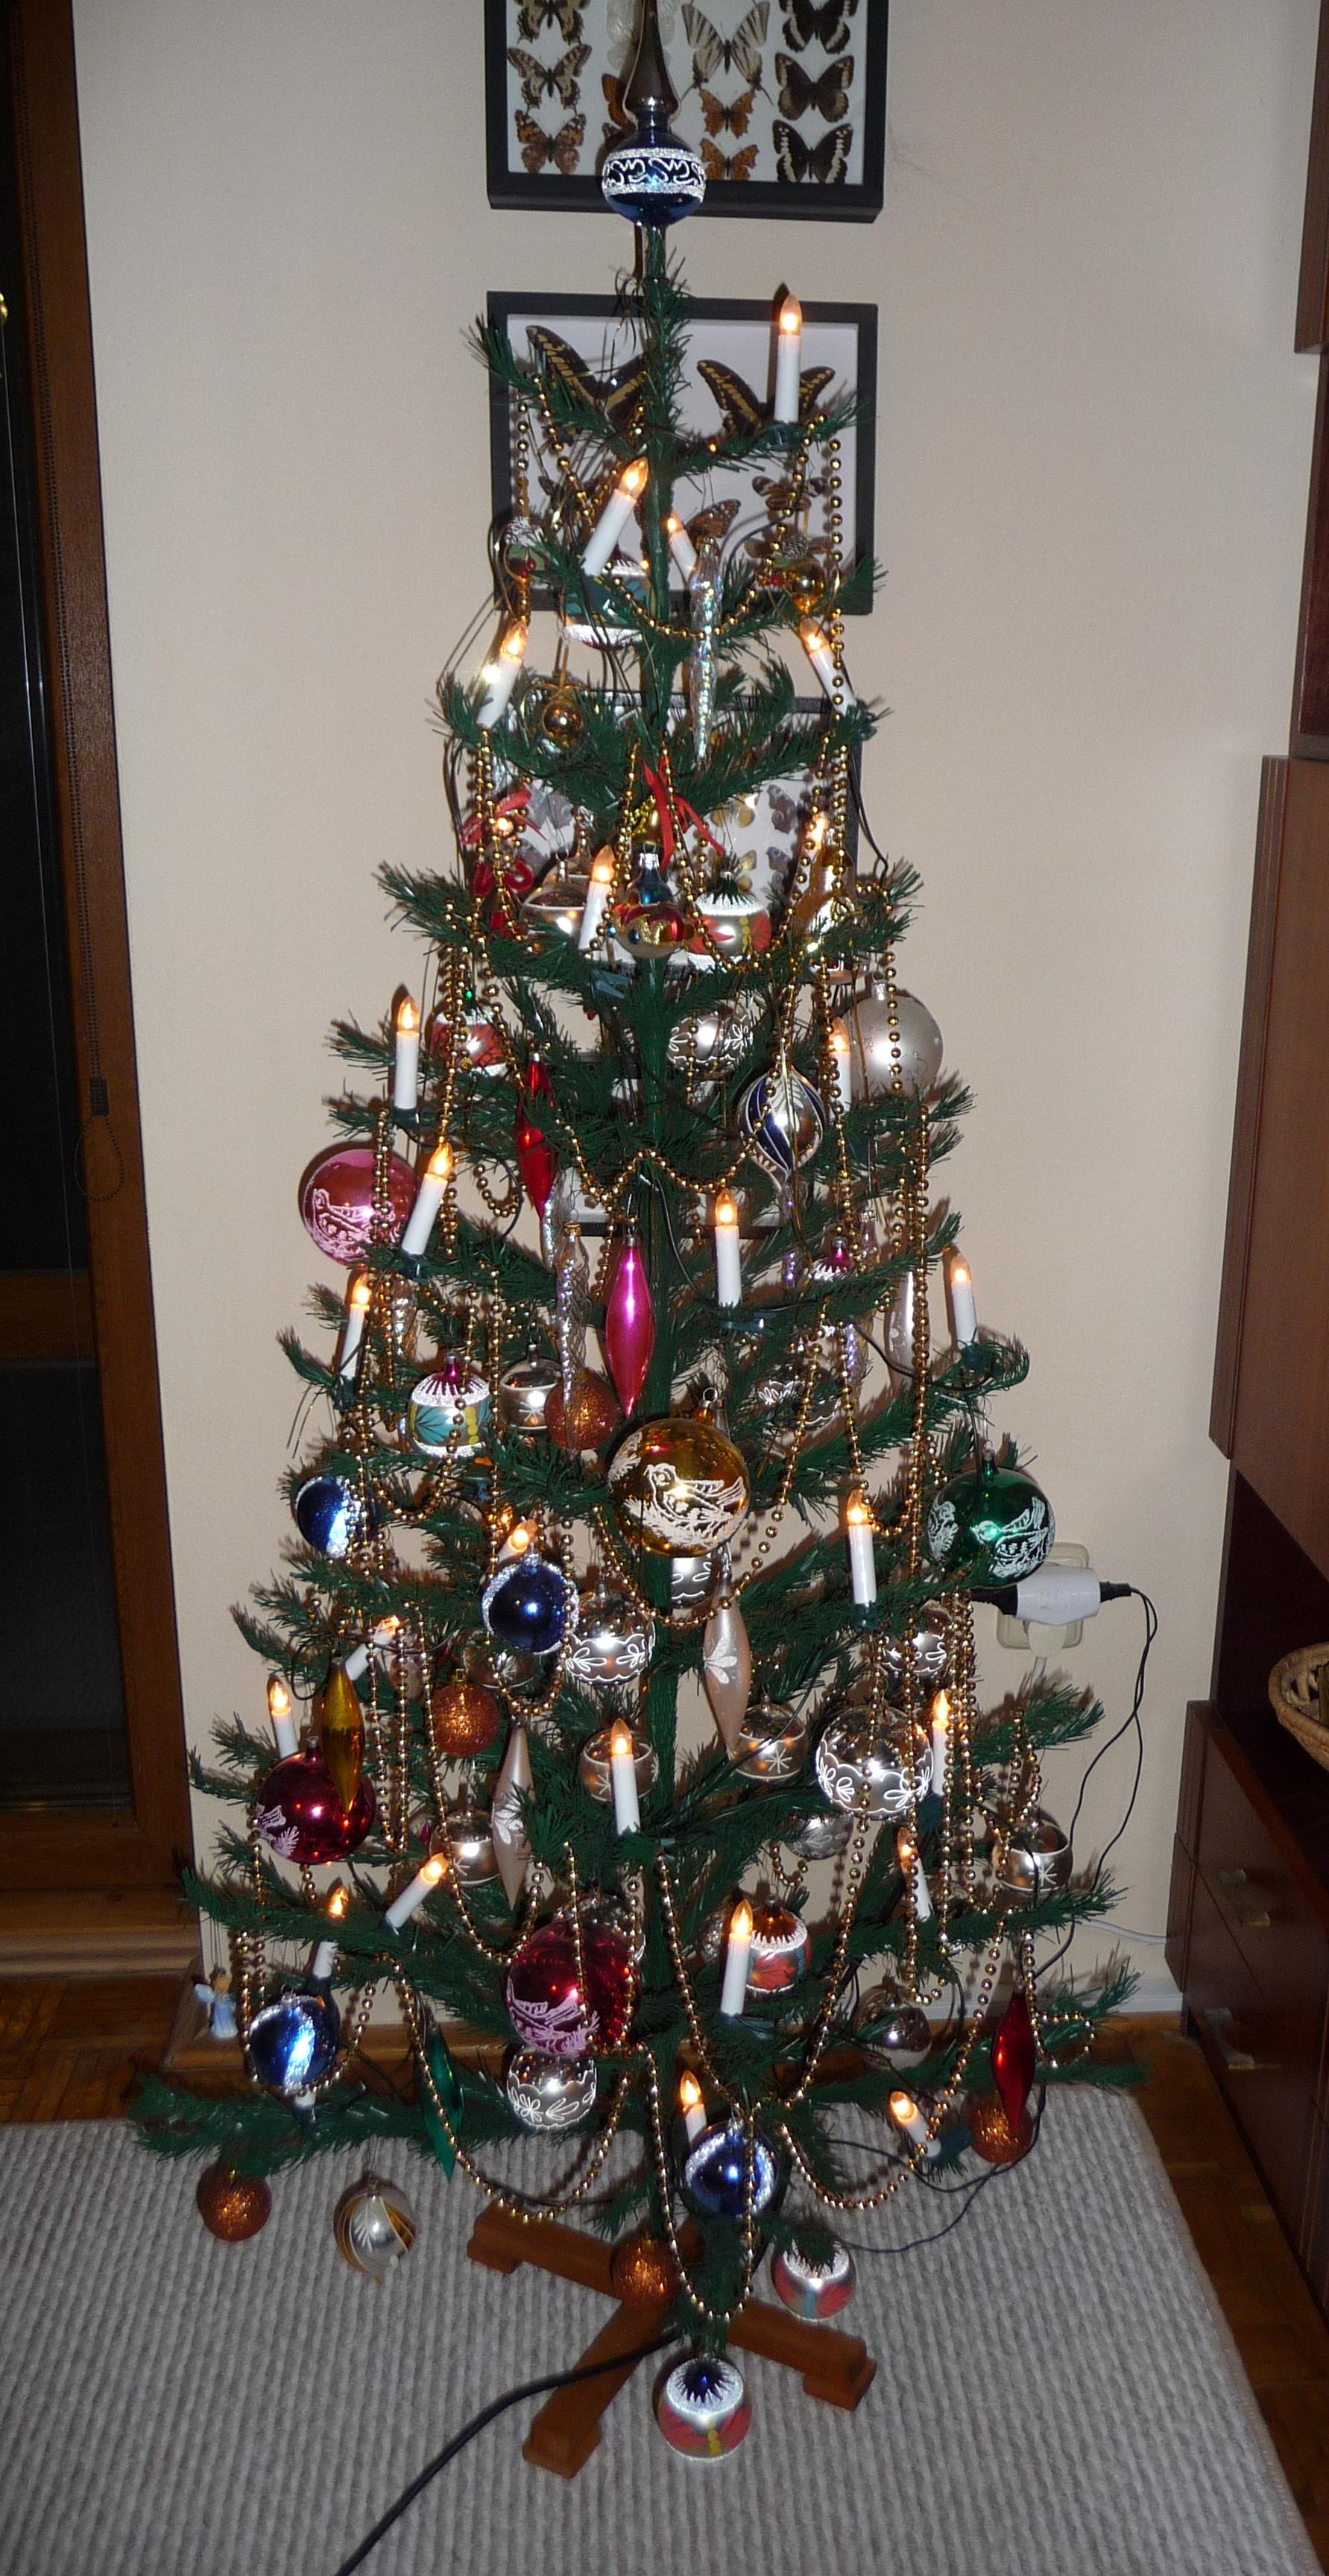 File:Kitsch Christmas tree (2).jpg - Wikimedia Commons